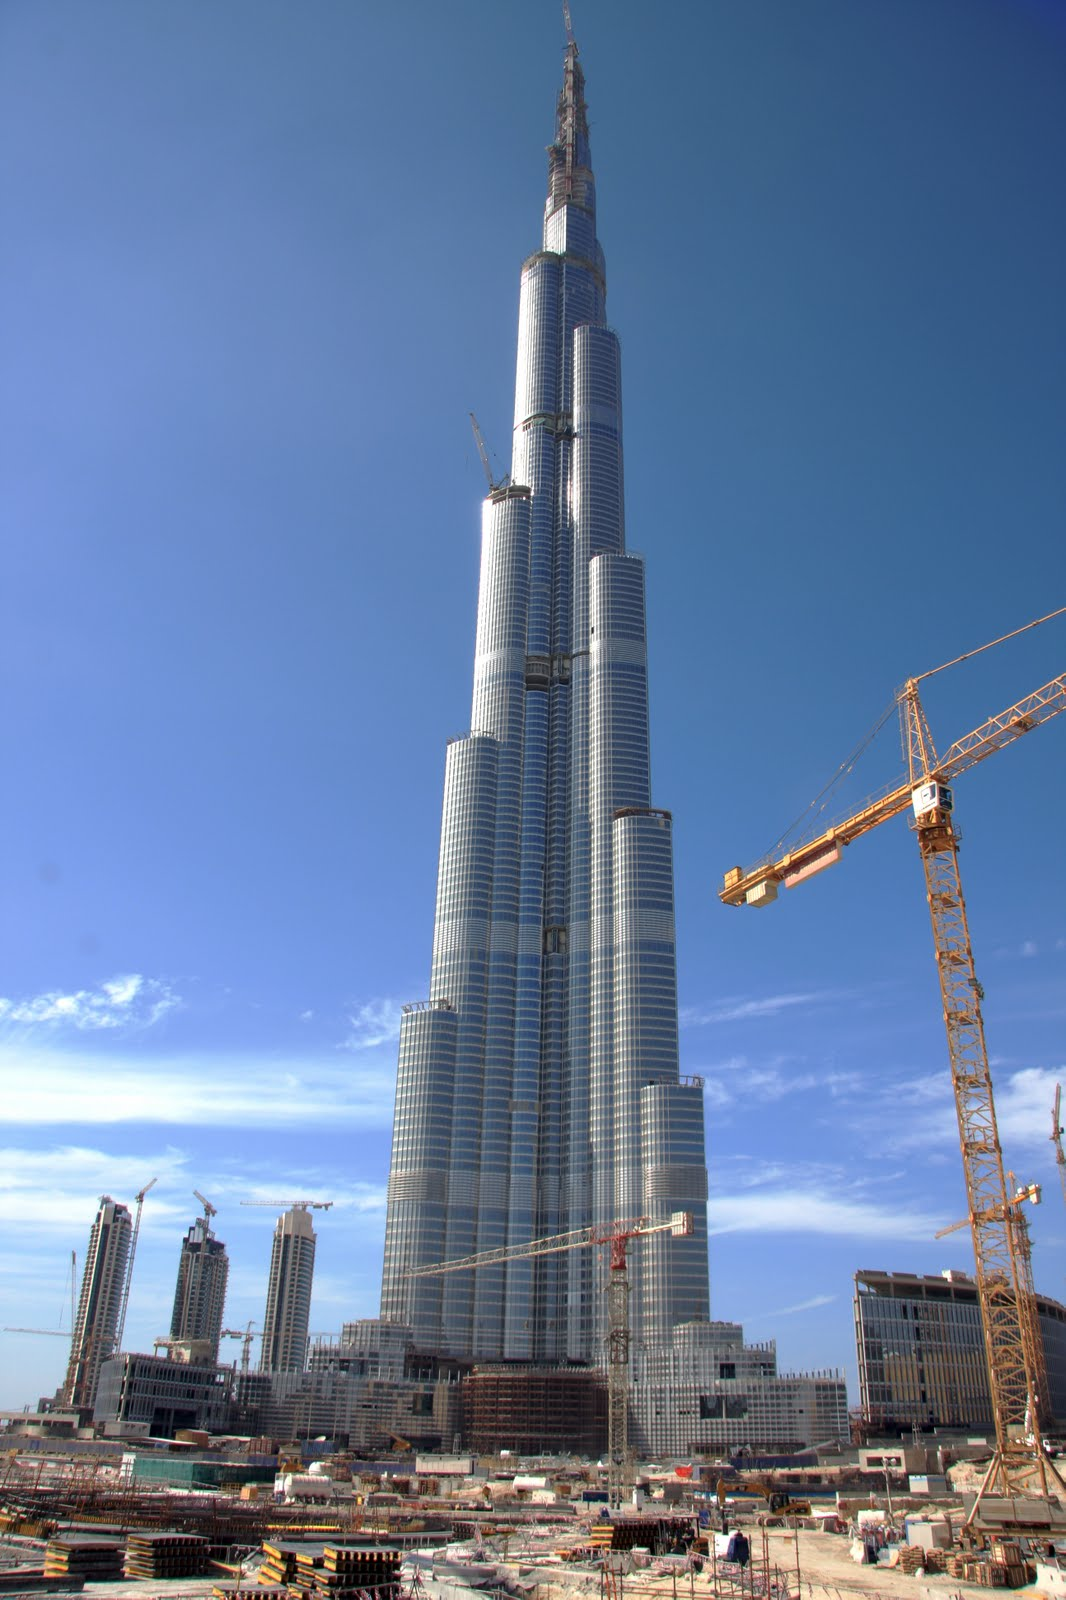 All World Visits Burj Dubai Tower